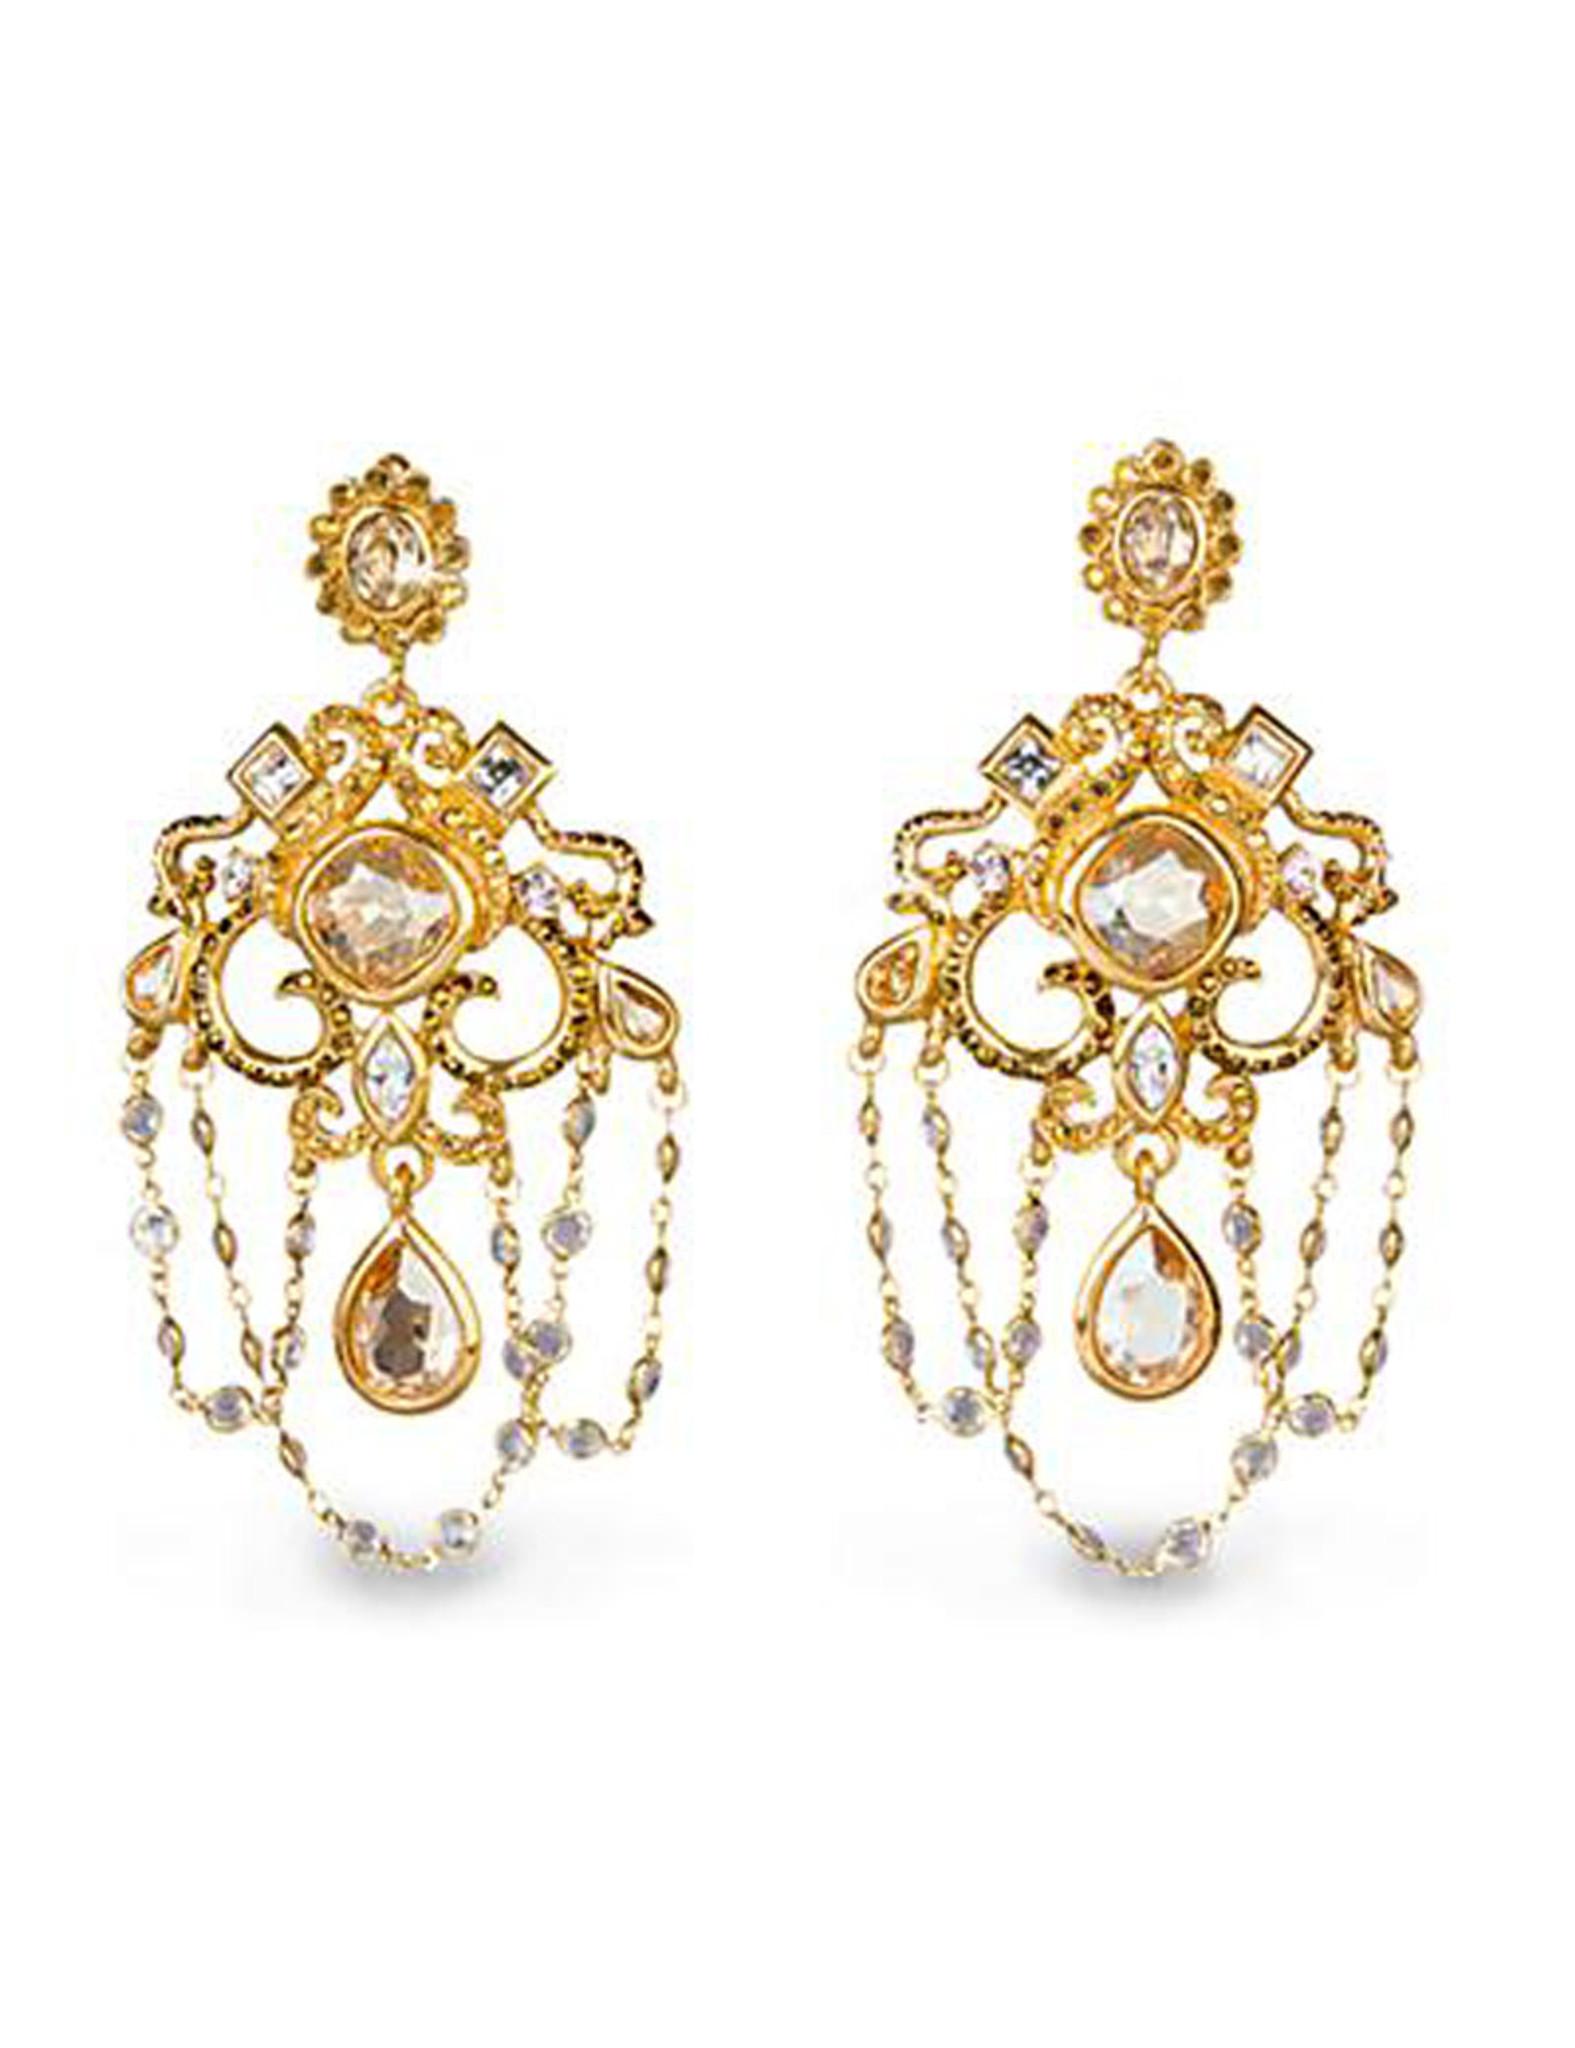 Jay strongwater golden chandelier clip earrings sj9252 232 homebello jay strongwater golden chandelier clip earrings mpn sj9252 232 aloadofball Image collections